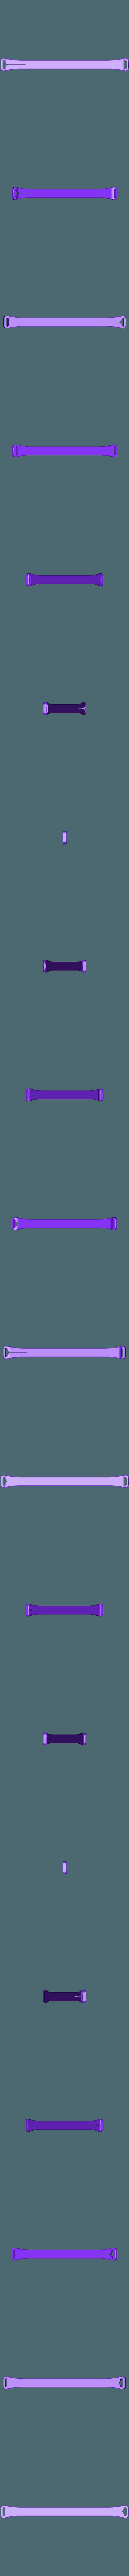 Keychain_Strap_v1-3_100mm.STL Download free STL file Keyring Strap • 3D printable model, WalterHsiao